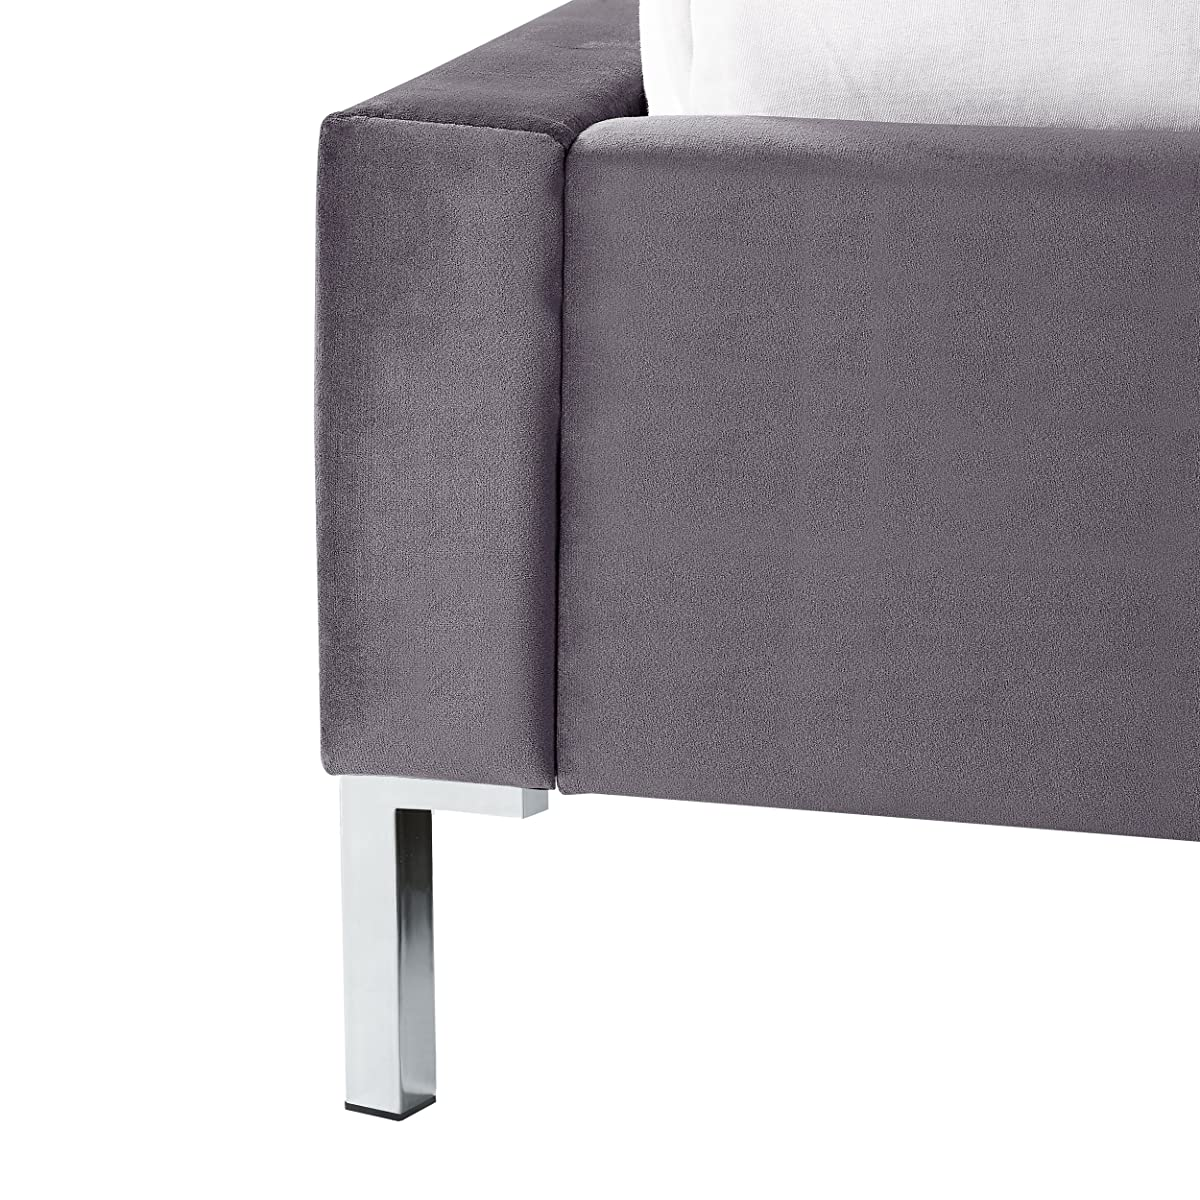 InspiredHome Grey Velvet Platform Bedframe – Design: Leonardo   King Size   Tufted   Modern   Nailhead Trim Finish